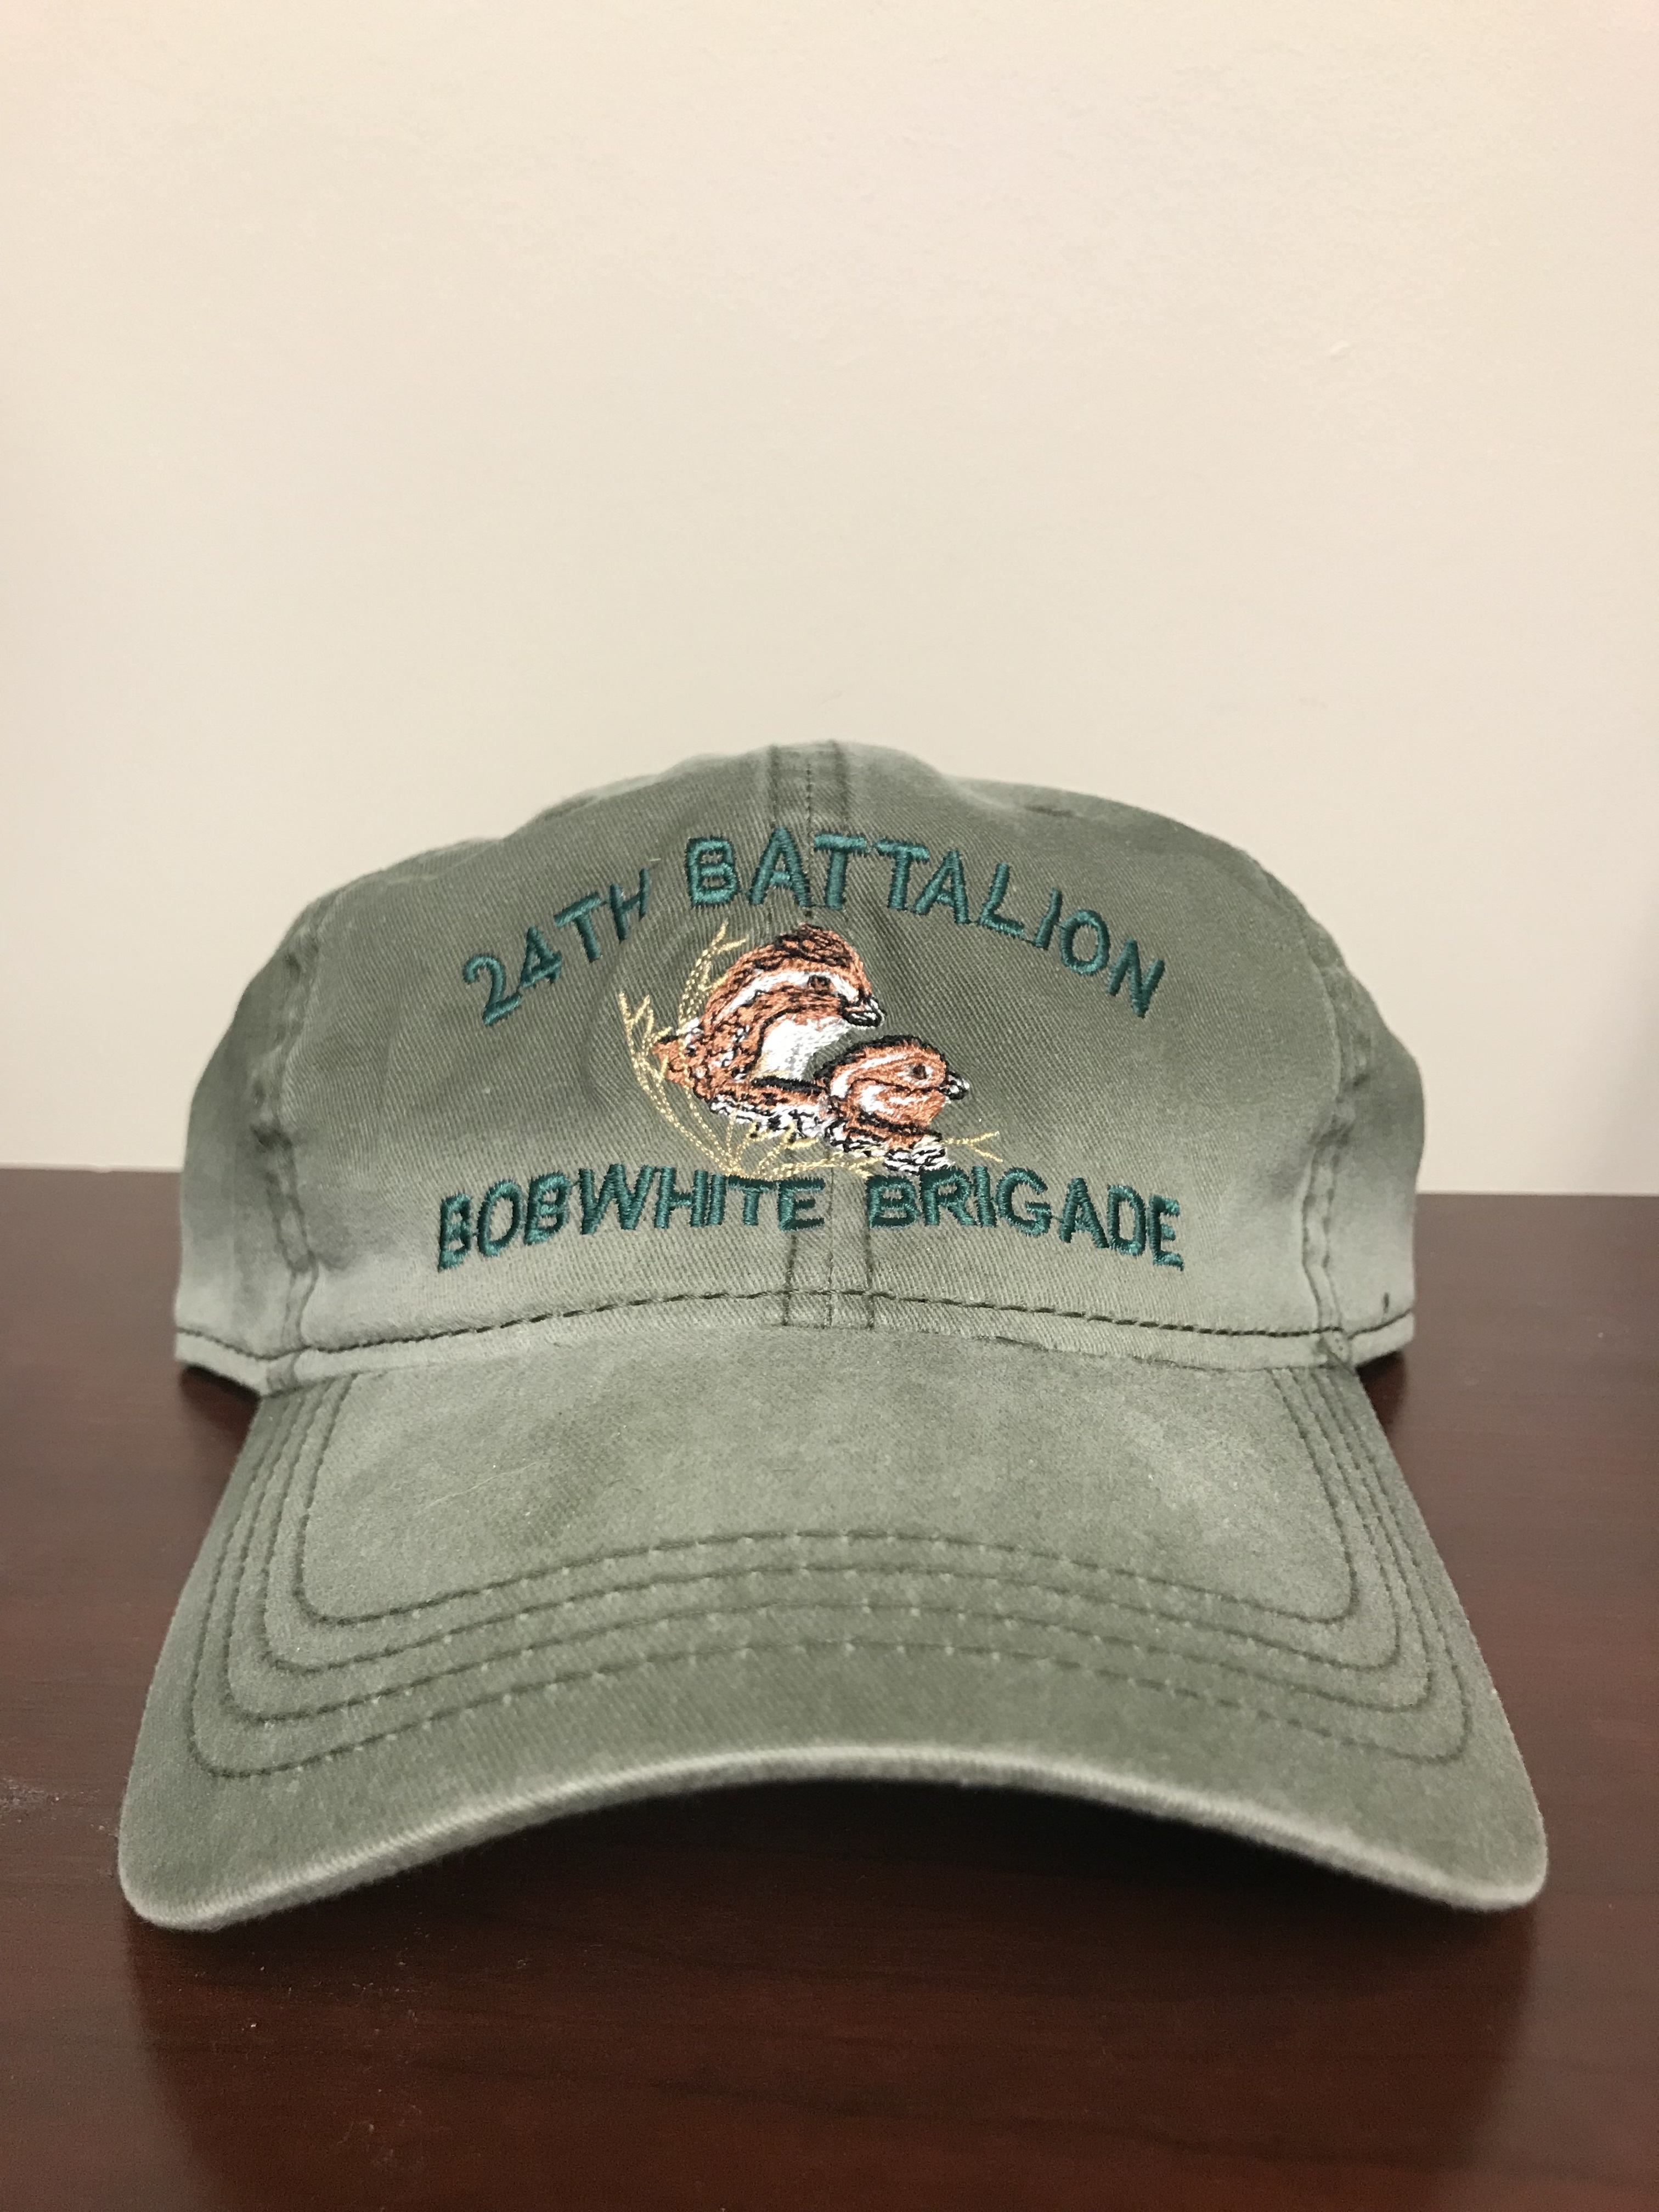 Rolling Plains Bobwhite Brigade 24th Battalion Cap 00028